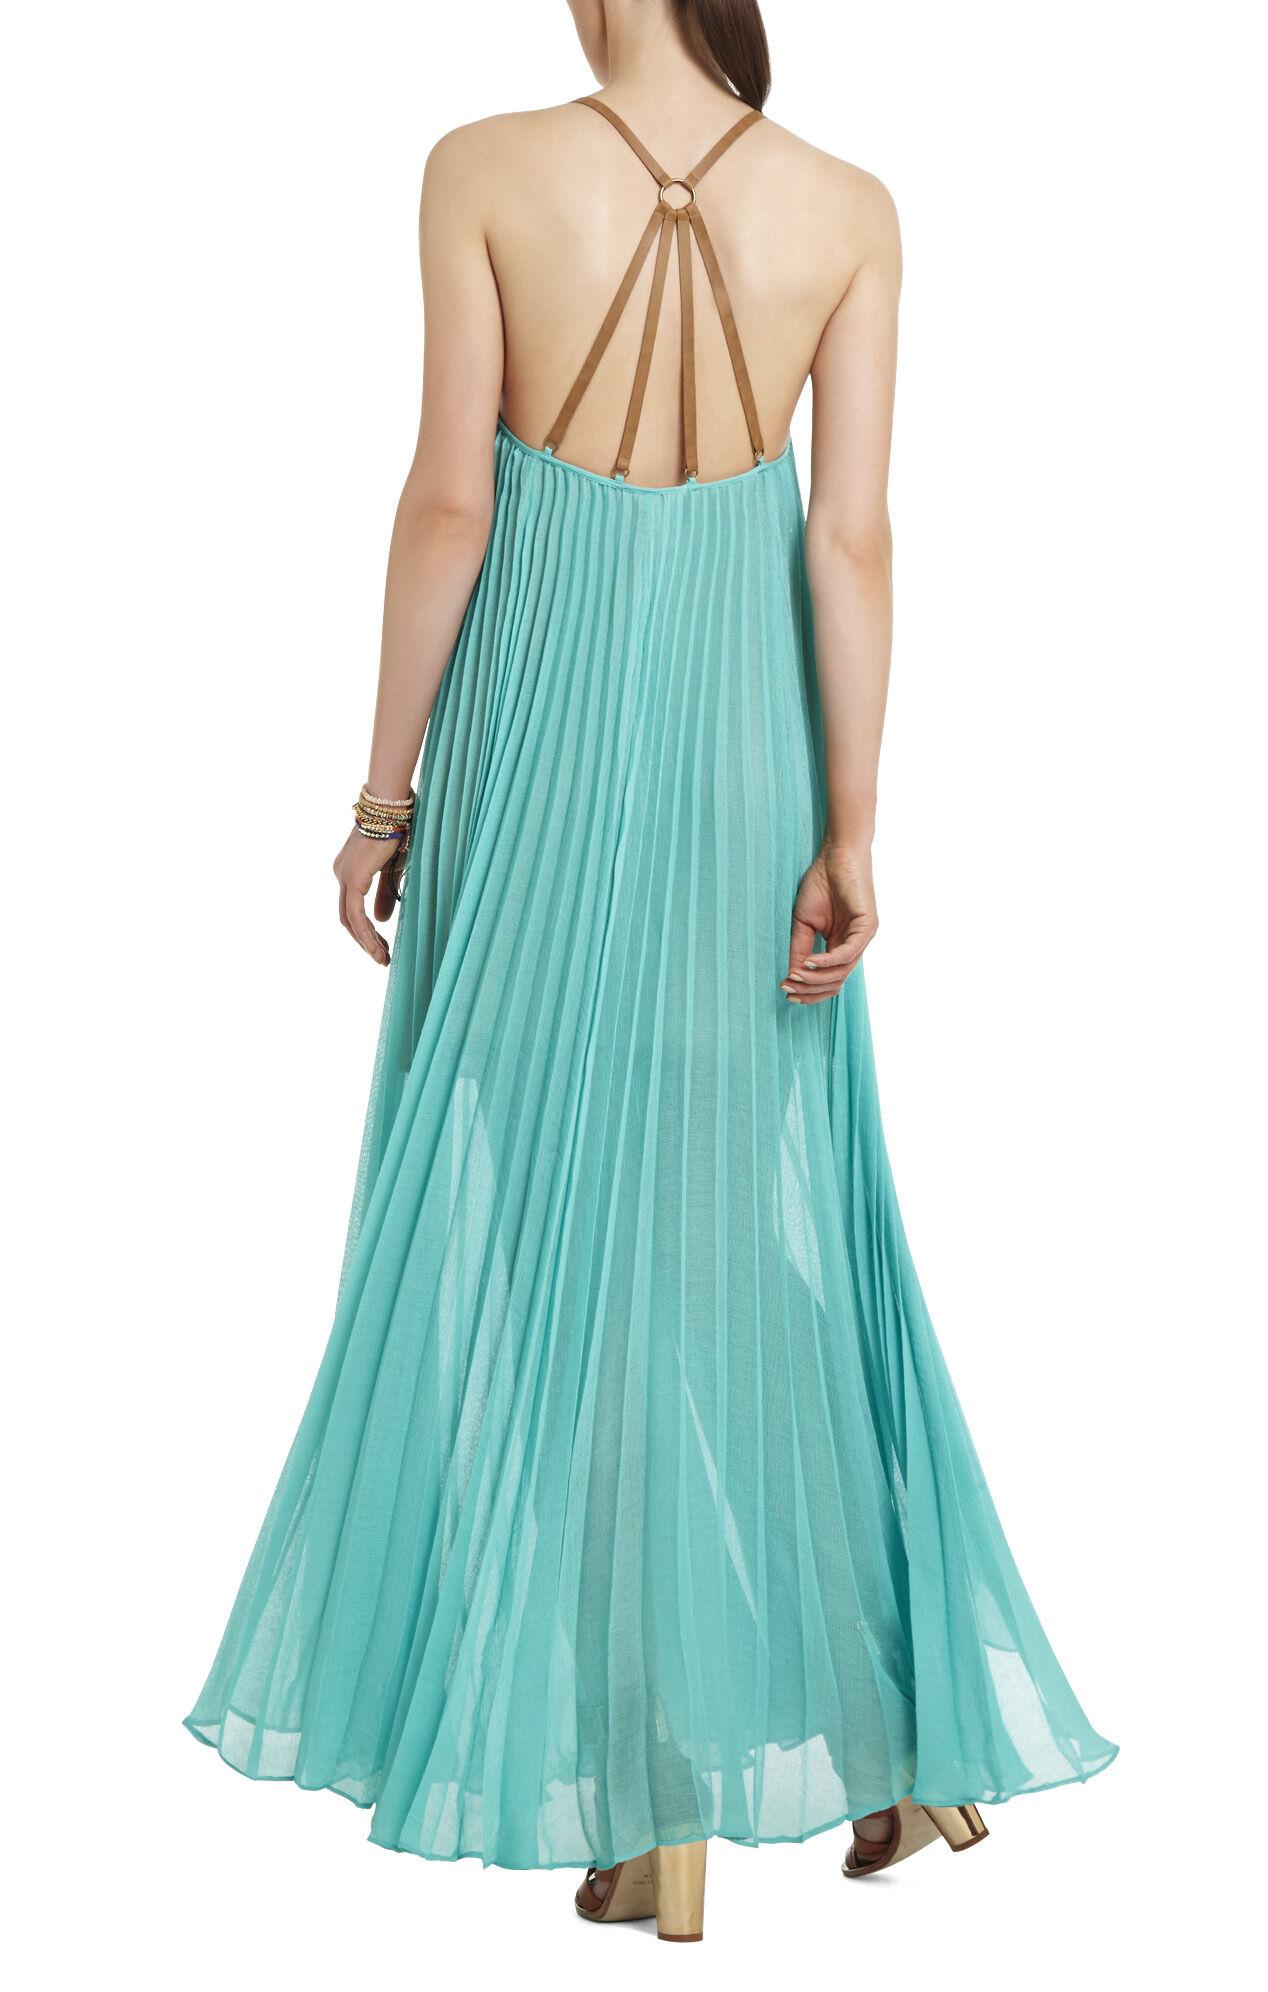 Brynna Sleeveless Pleated Maxi Dress